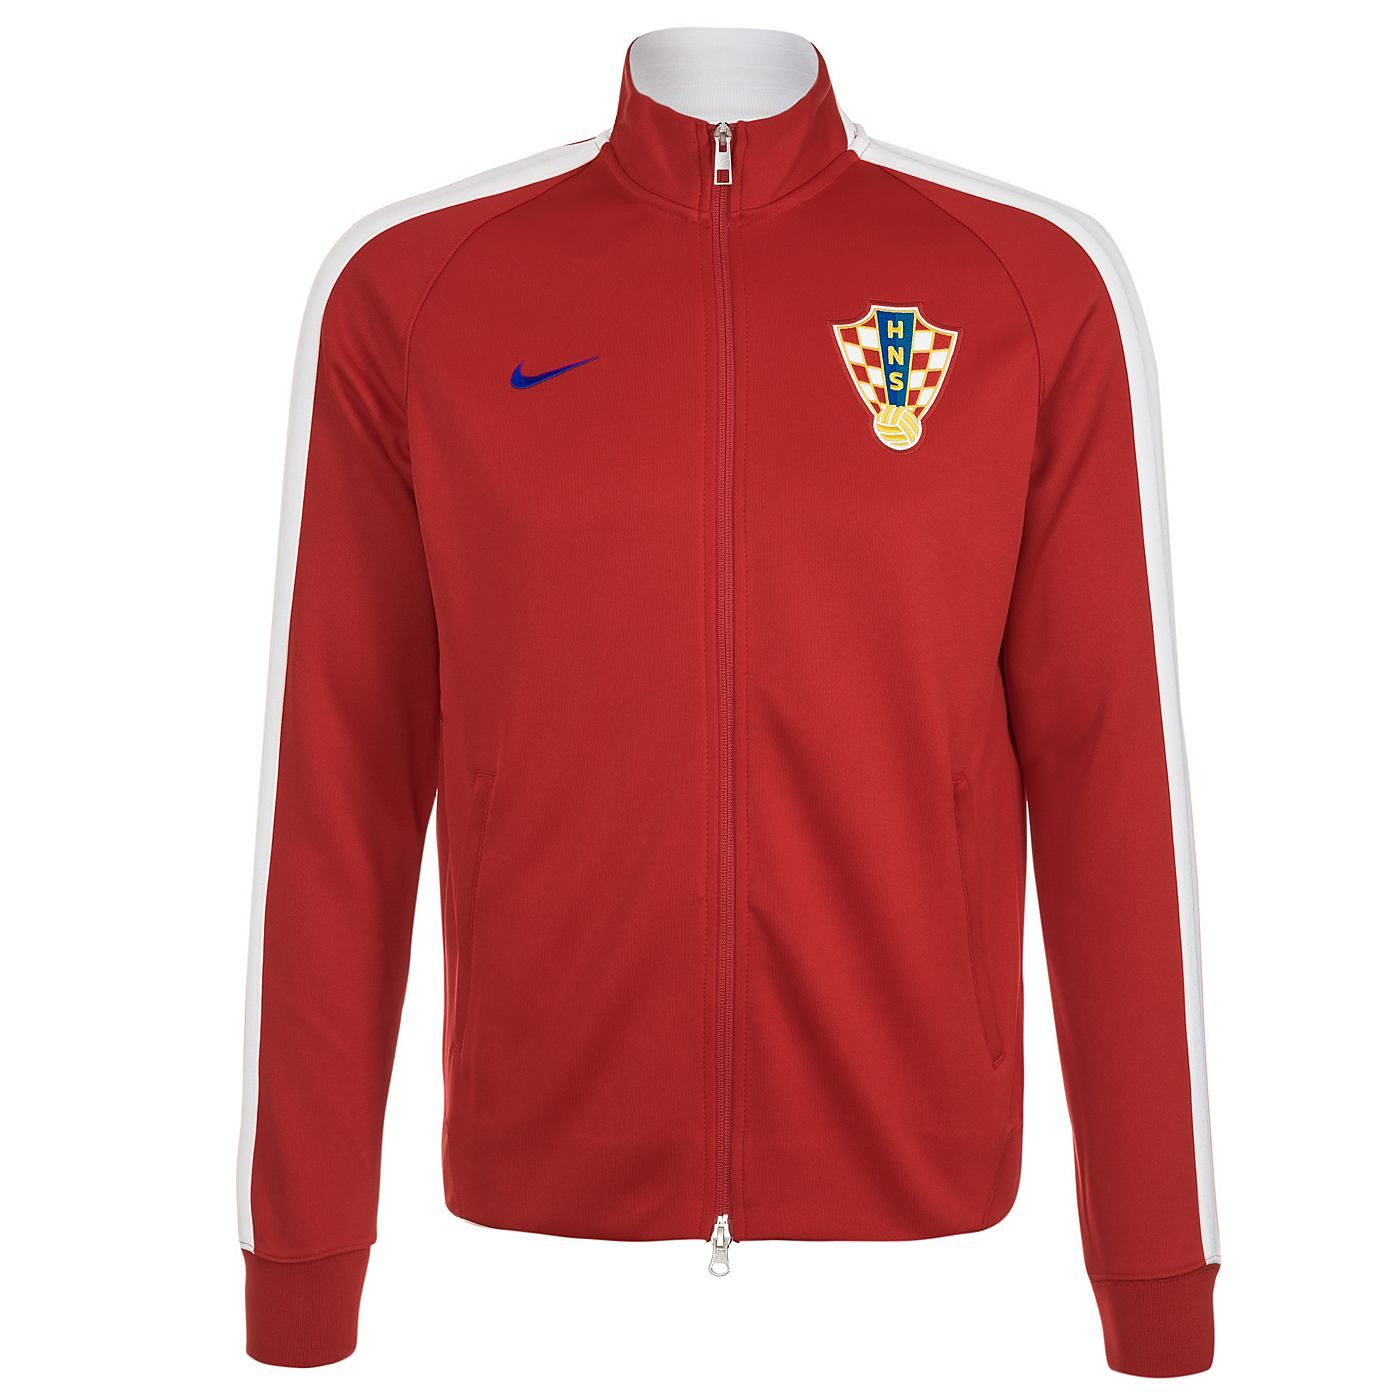 size 40 da11a 11283 Nike England Authentic Sideline T-Shirt EM 2016 Herren ...